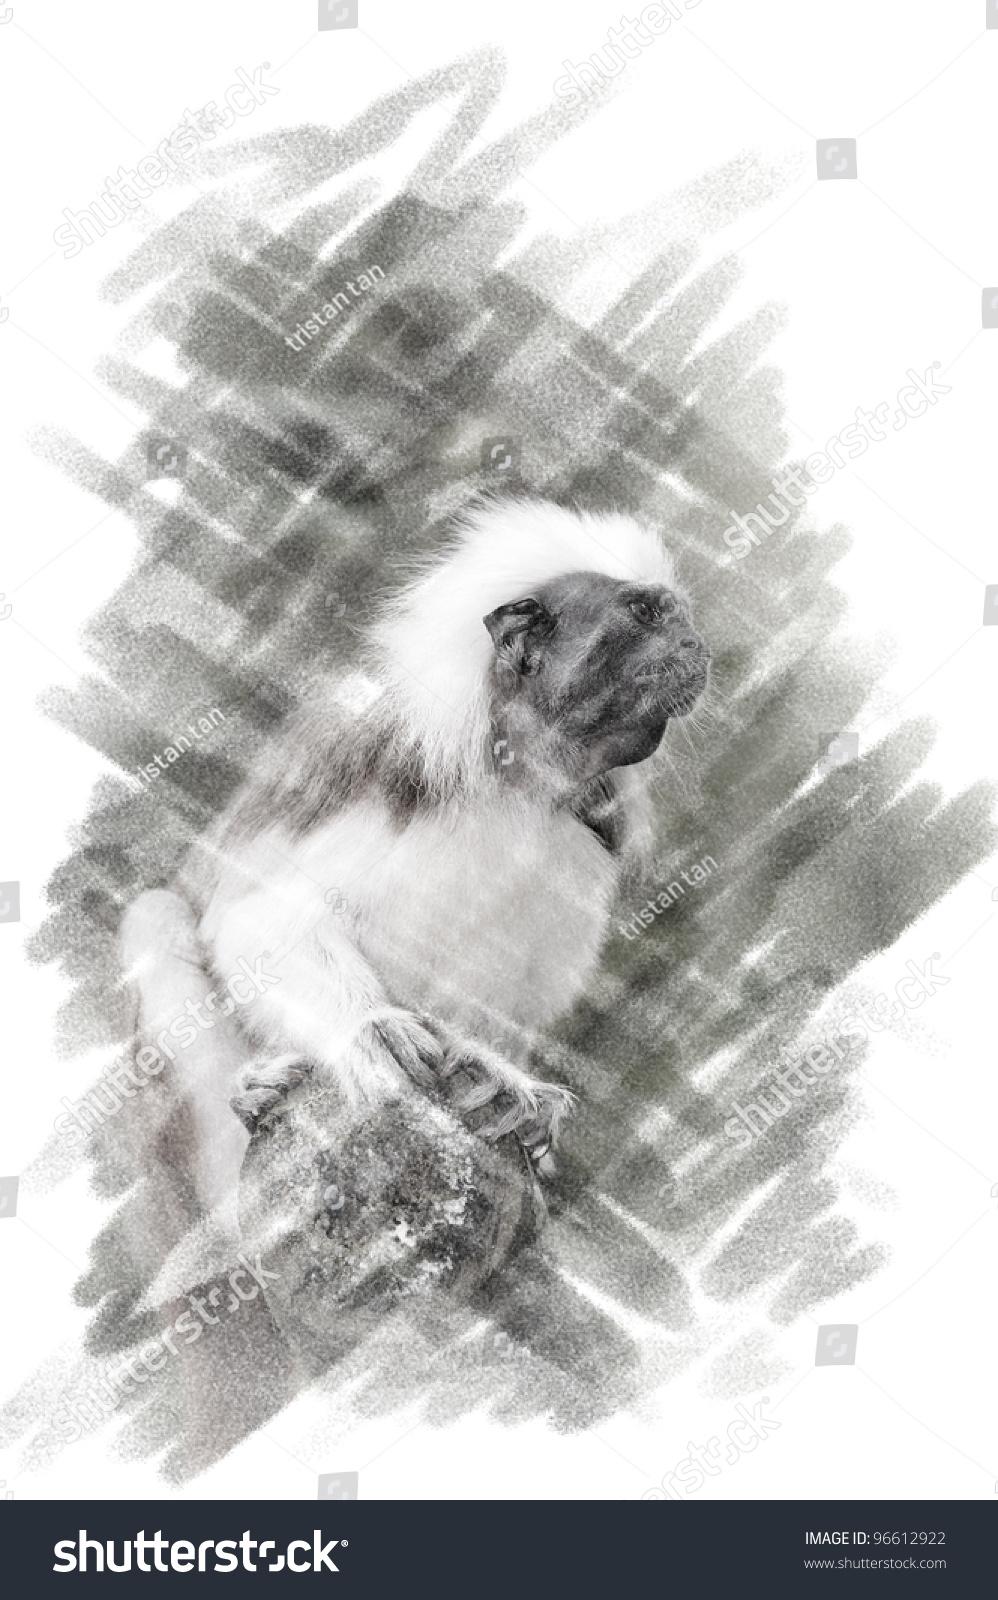 Pencil sketch of cotton top monkey